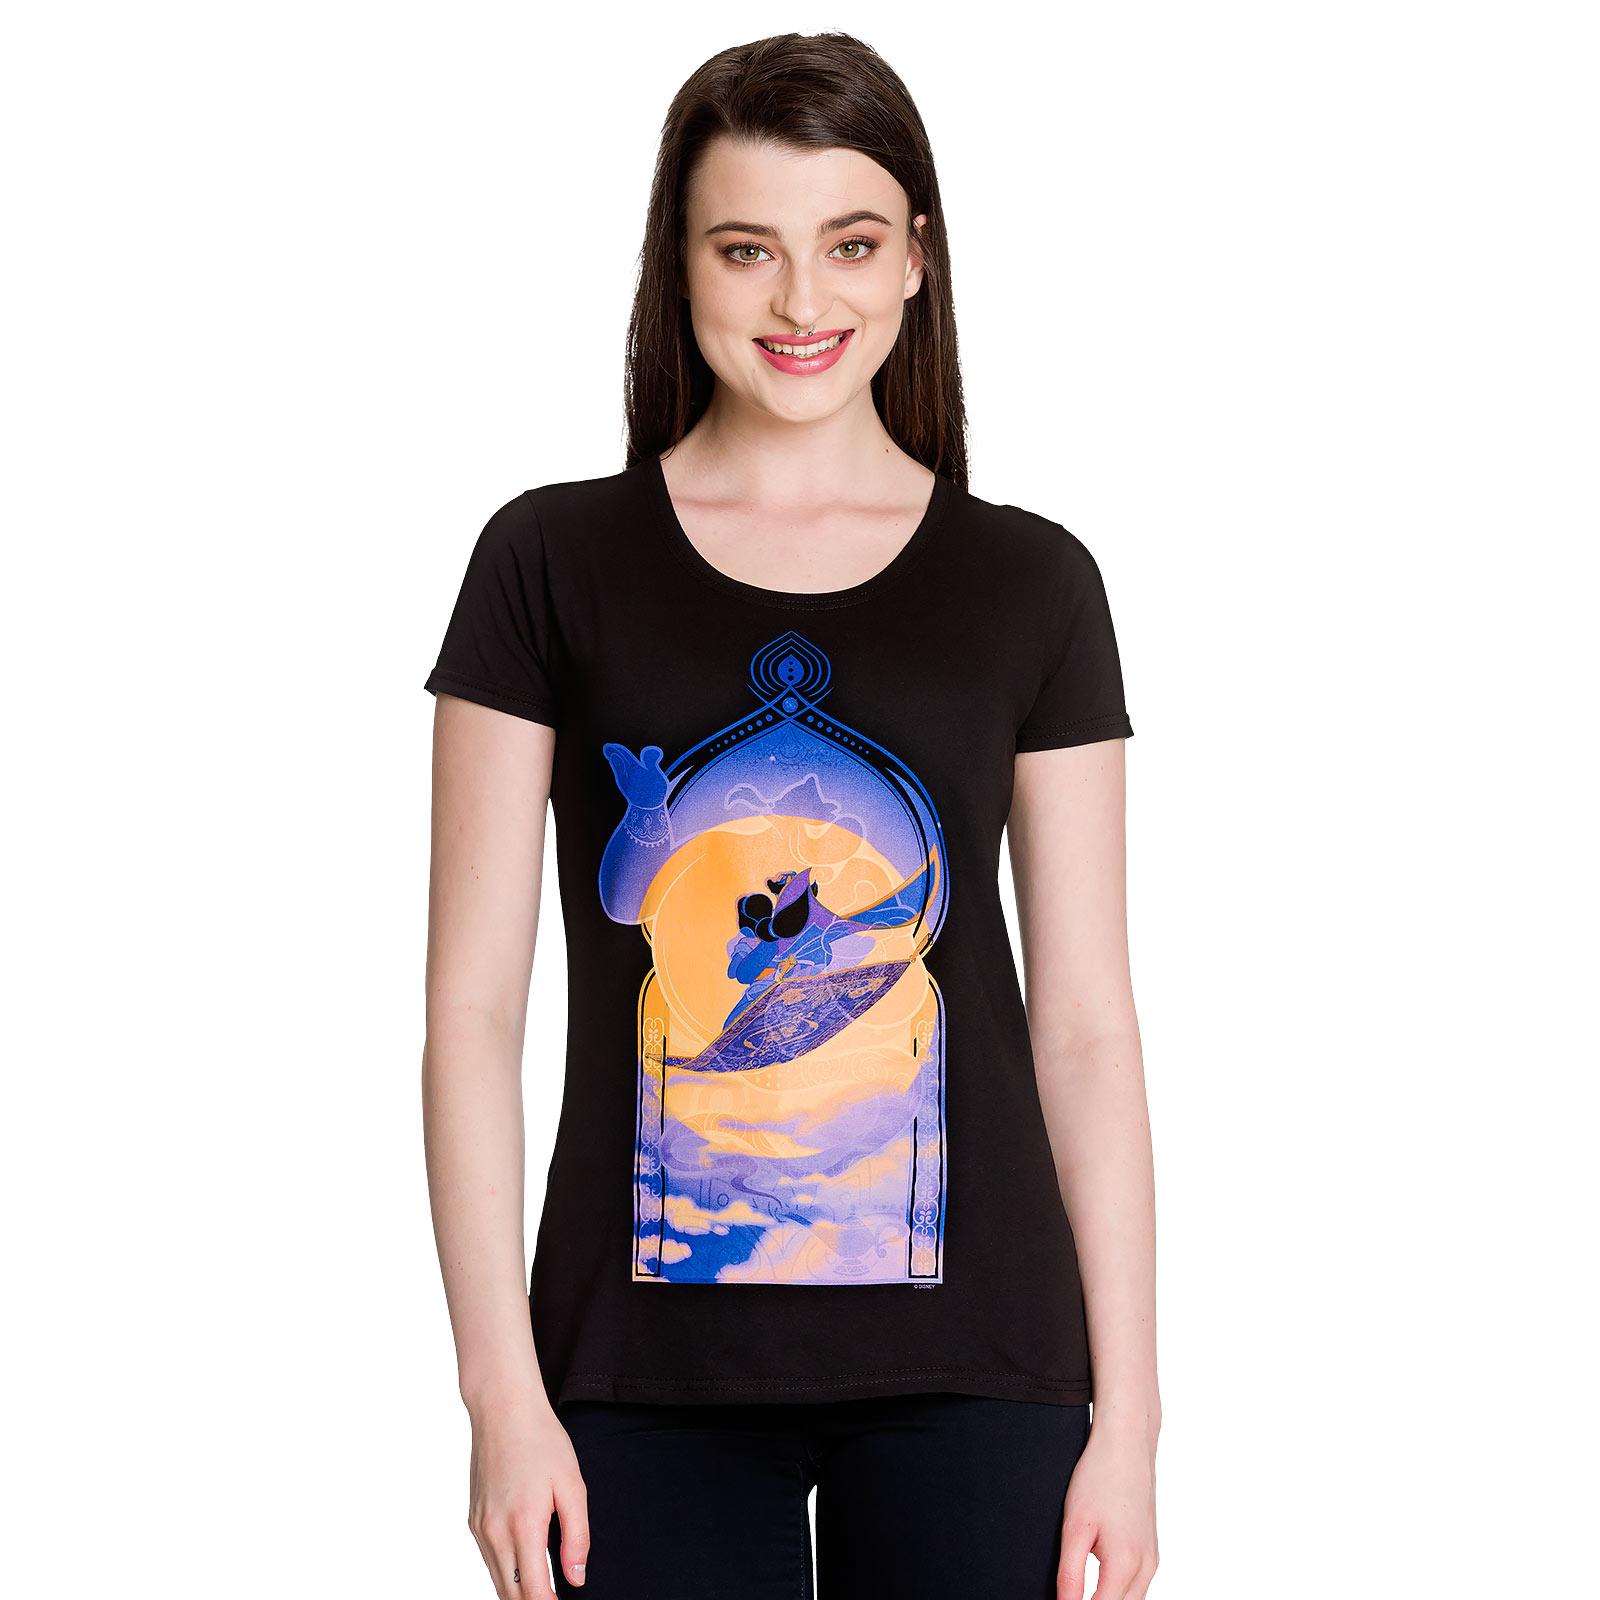 Aladdin - Carpet Ride T-Shirt Damen